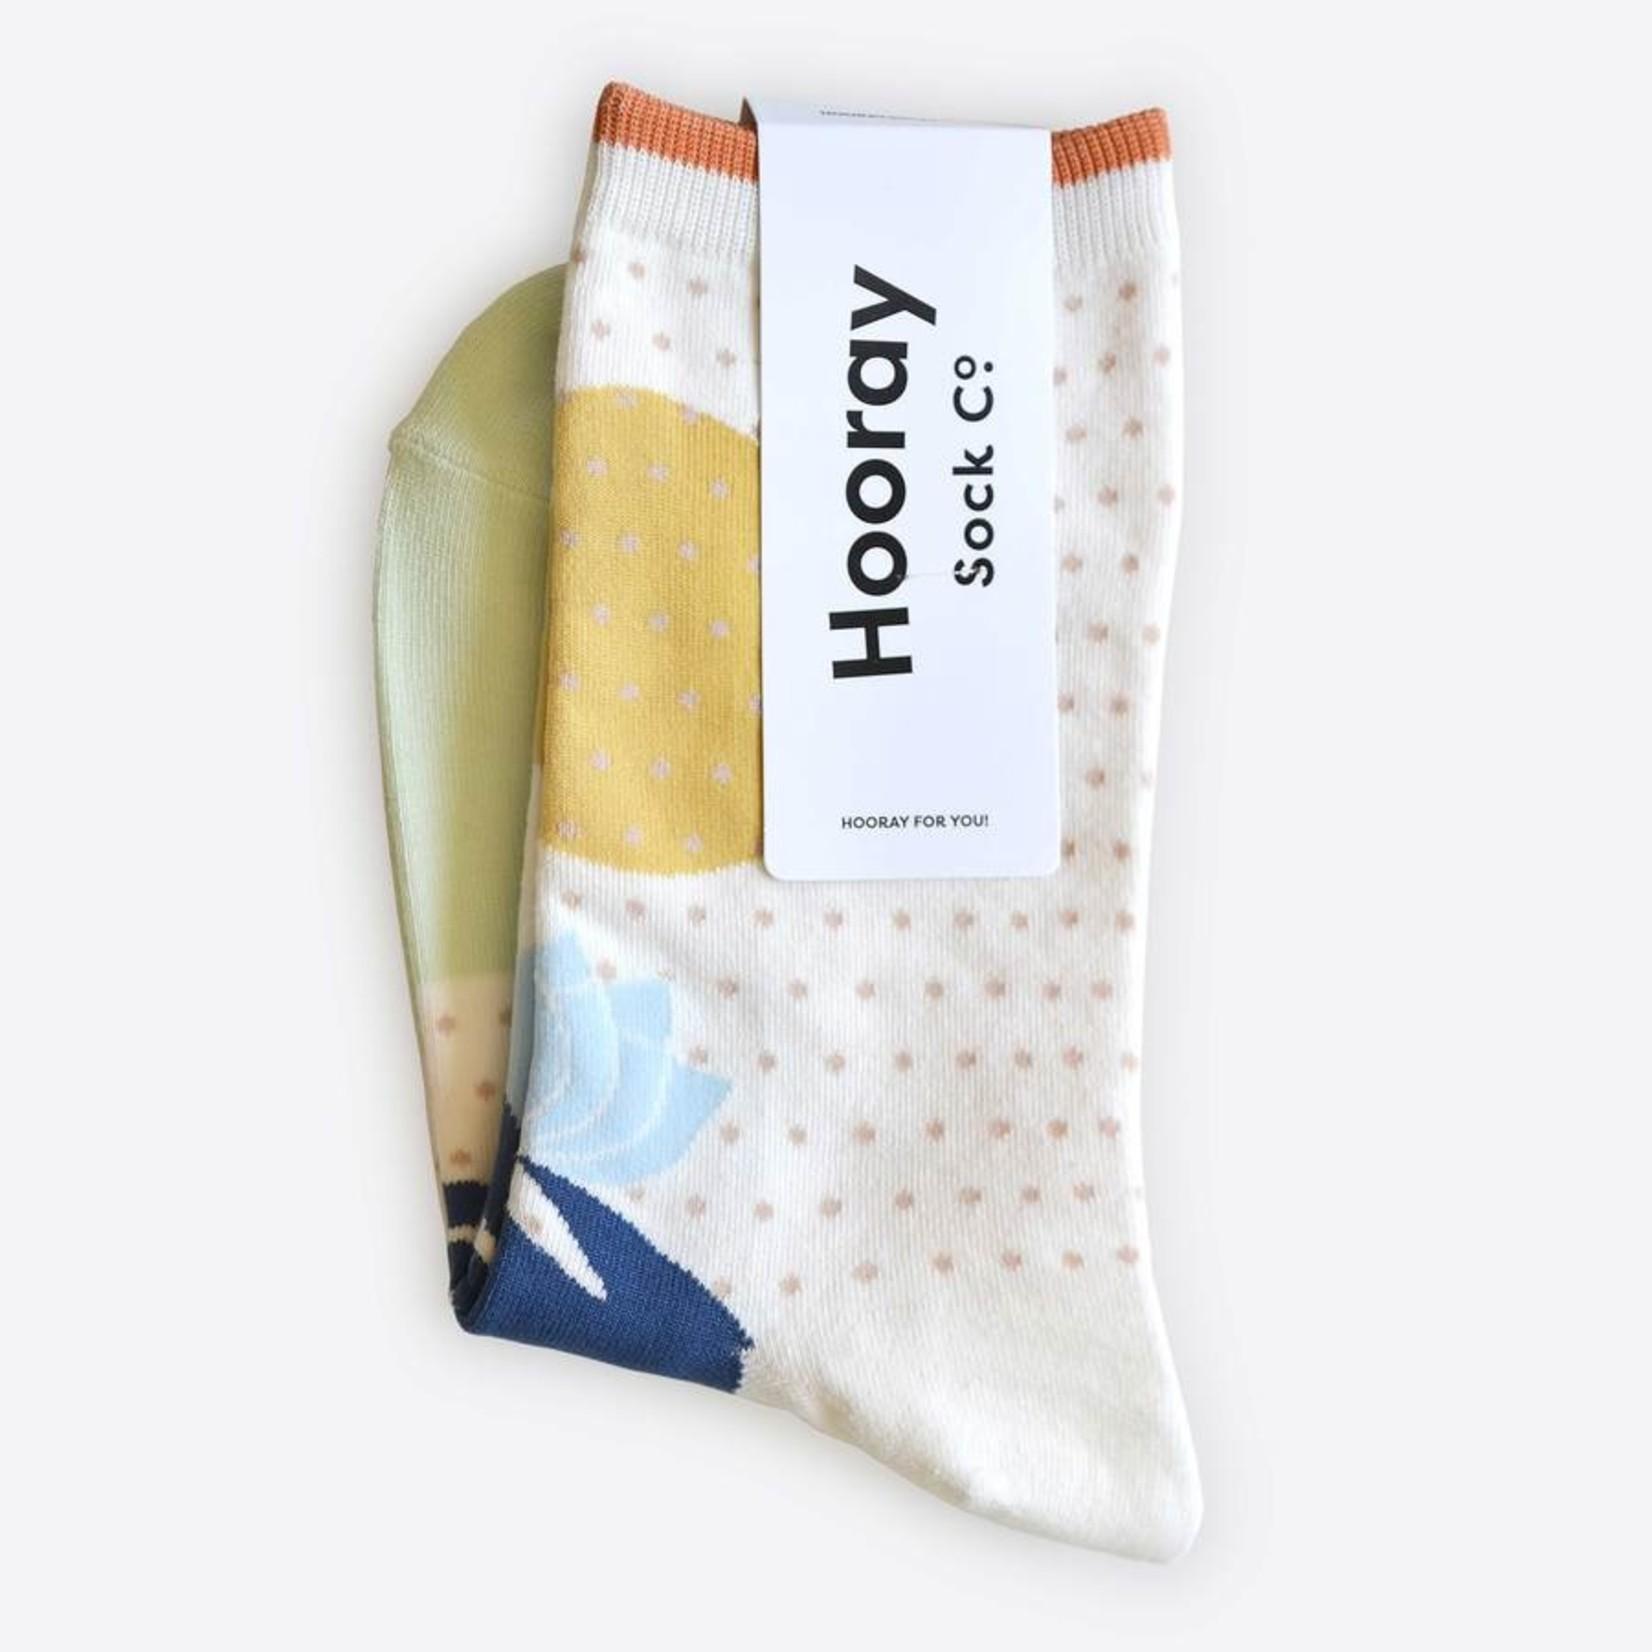 Hooray Sock Co. Lotus Cotton Socks